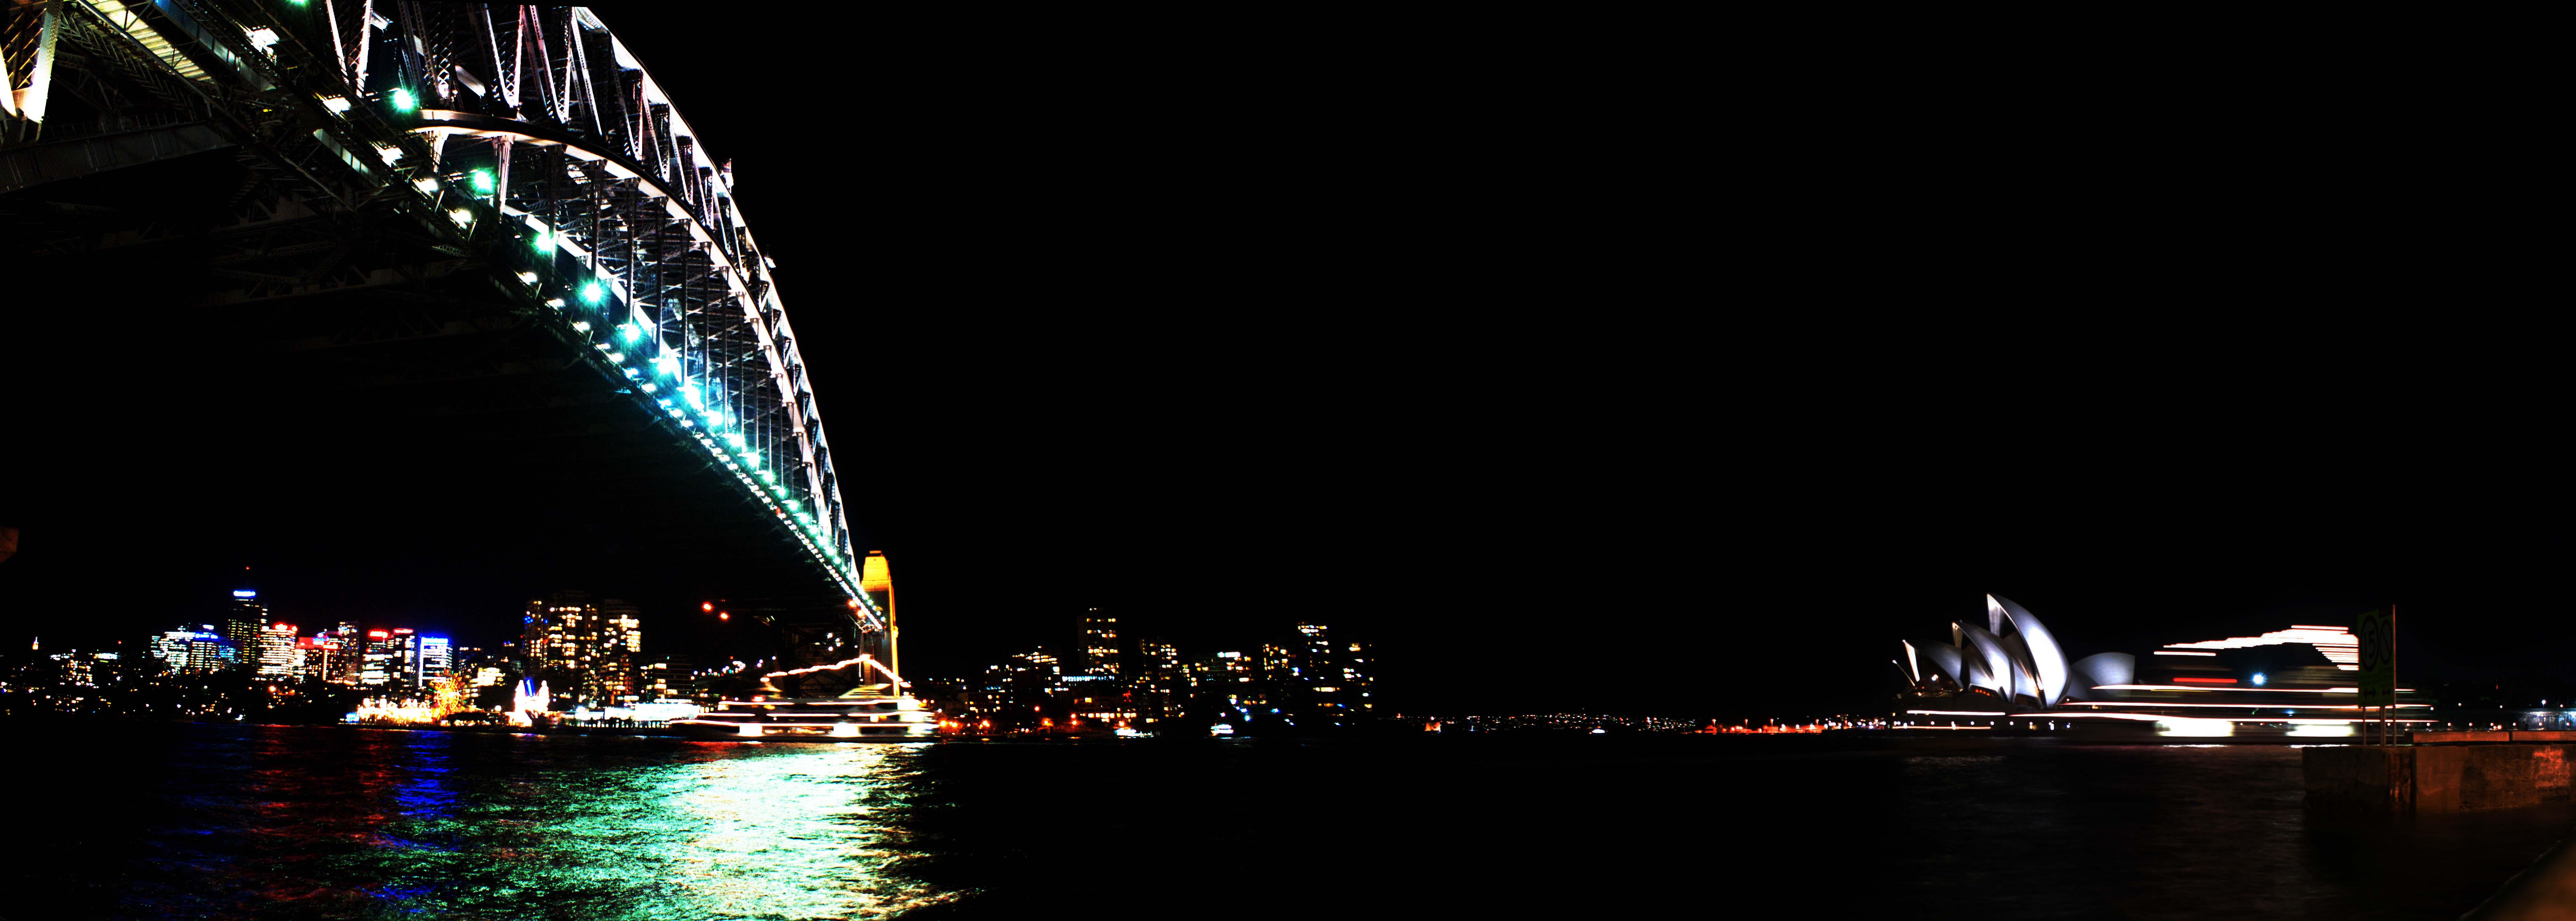 A work by Does - Sydney australia skyline